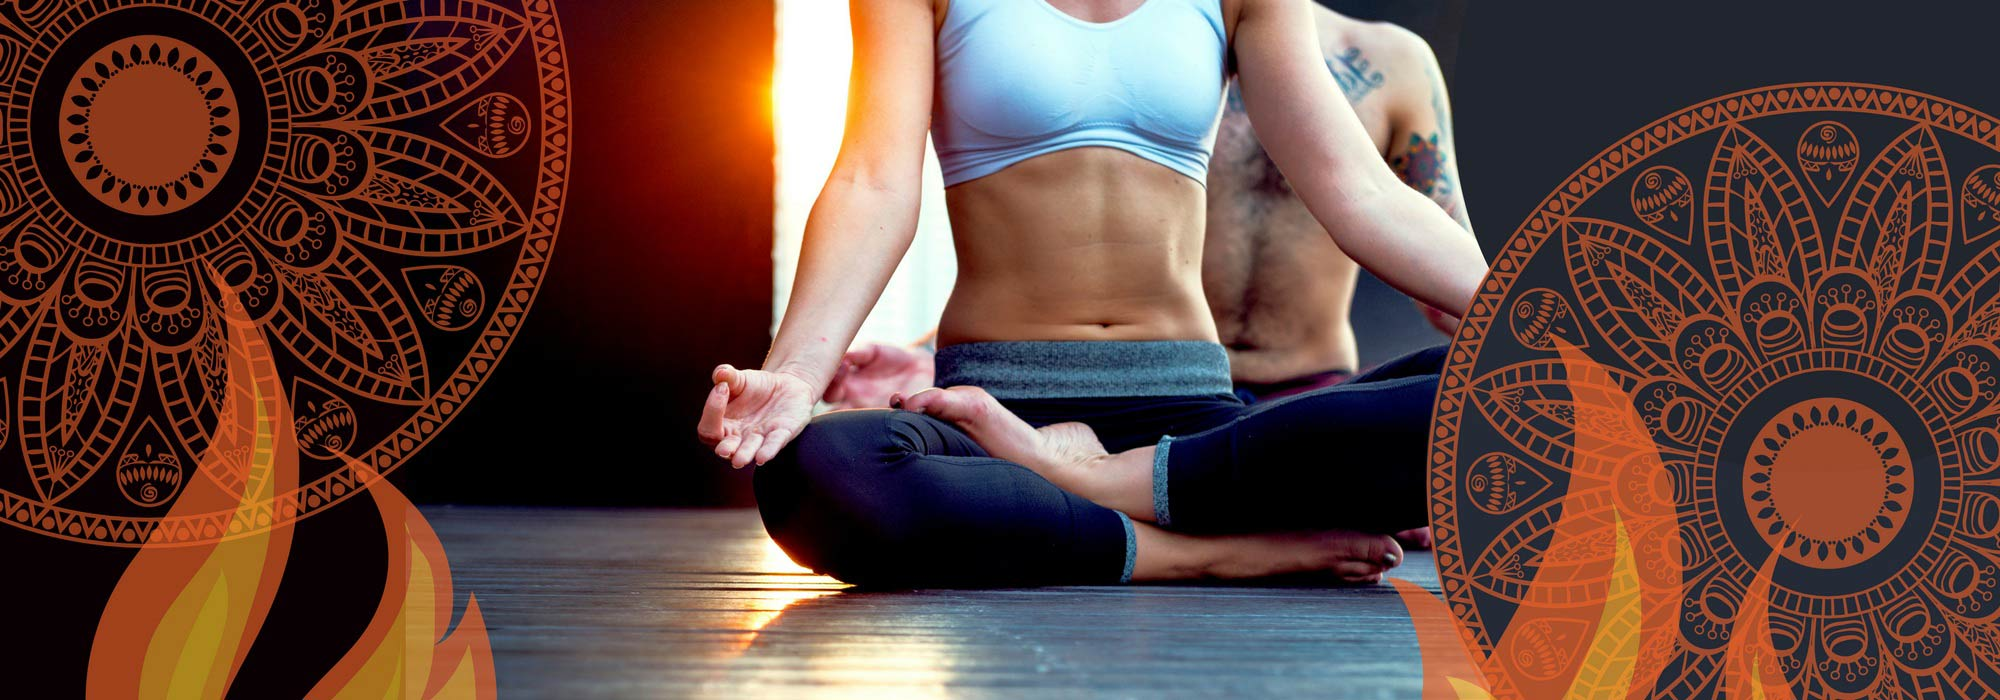 hot_yoga_banner-4